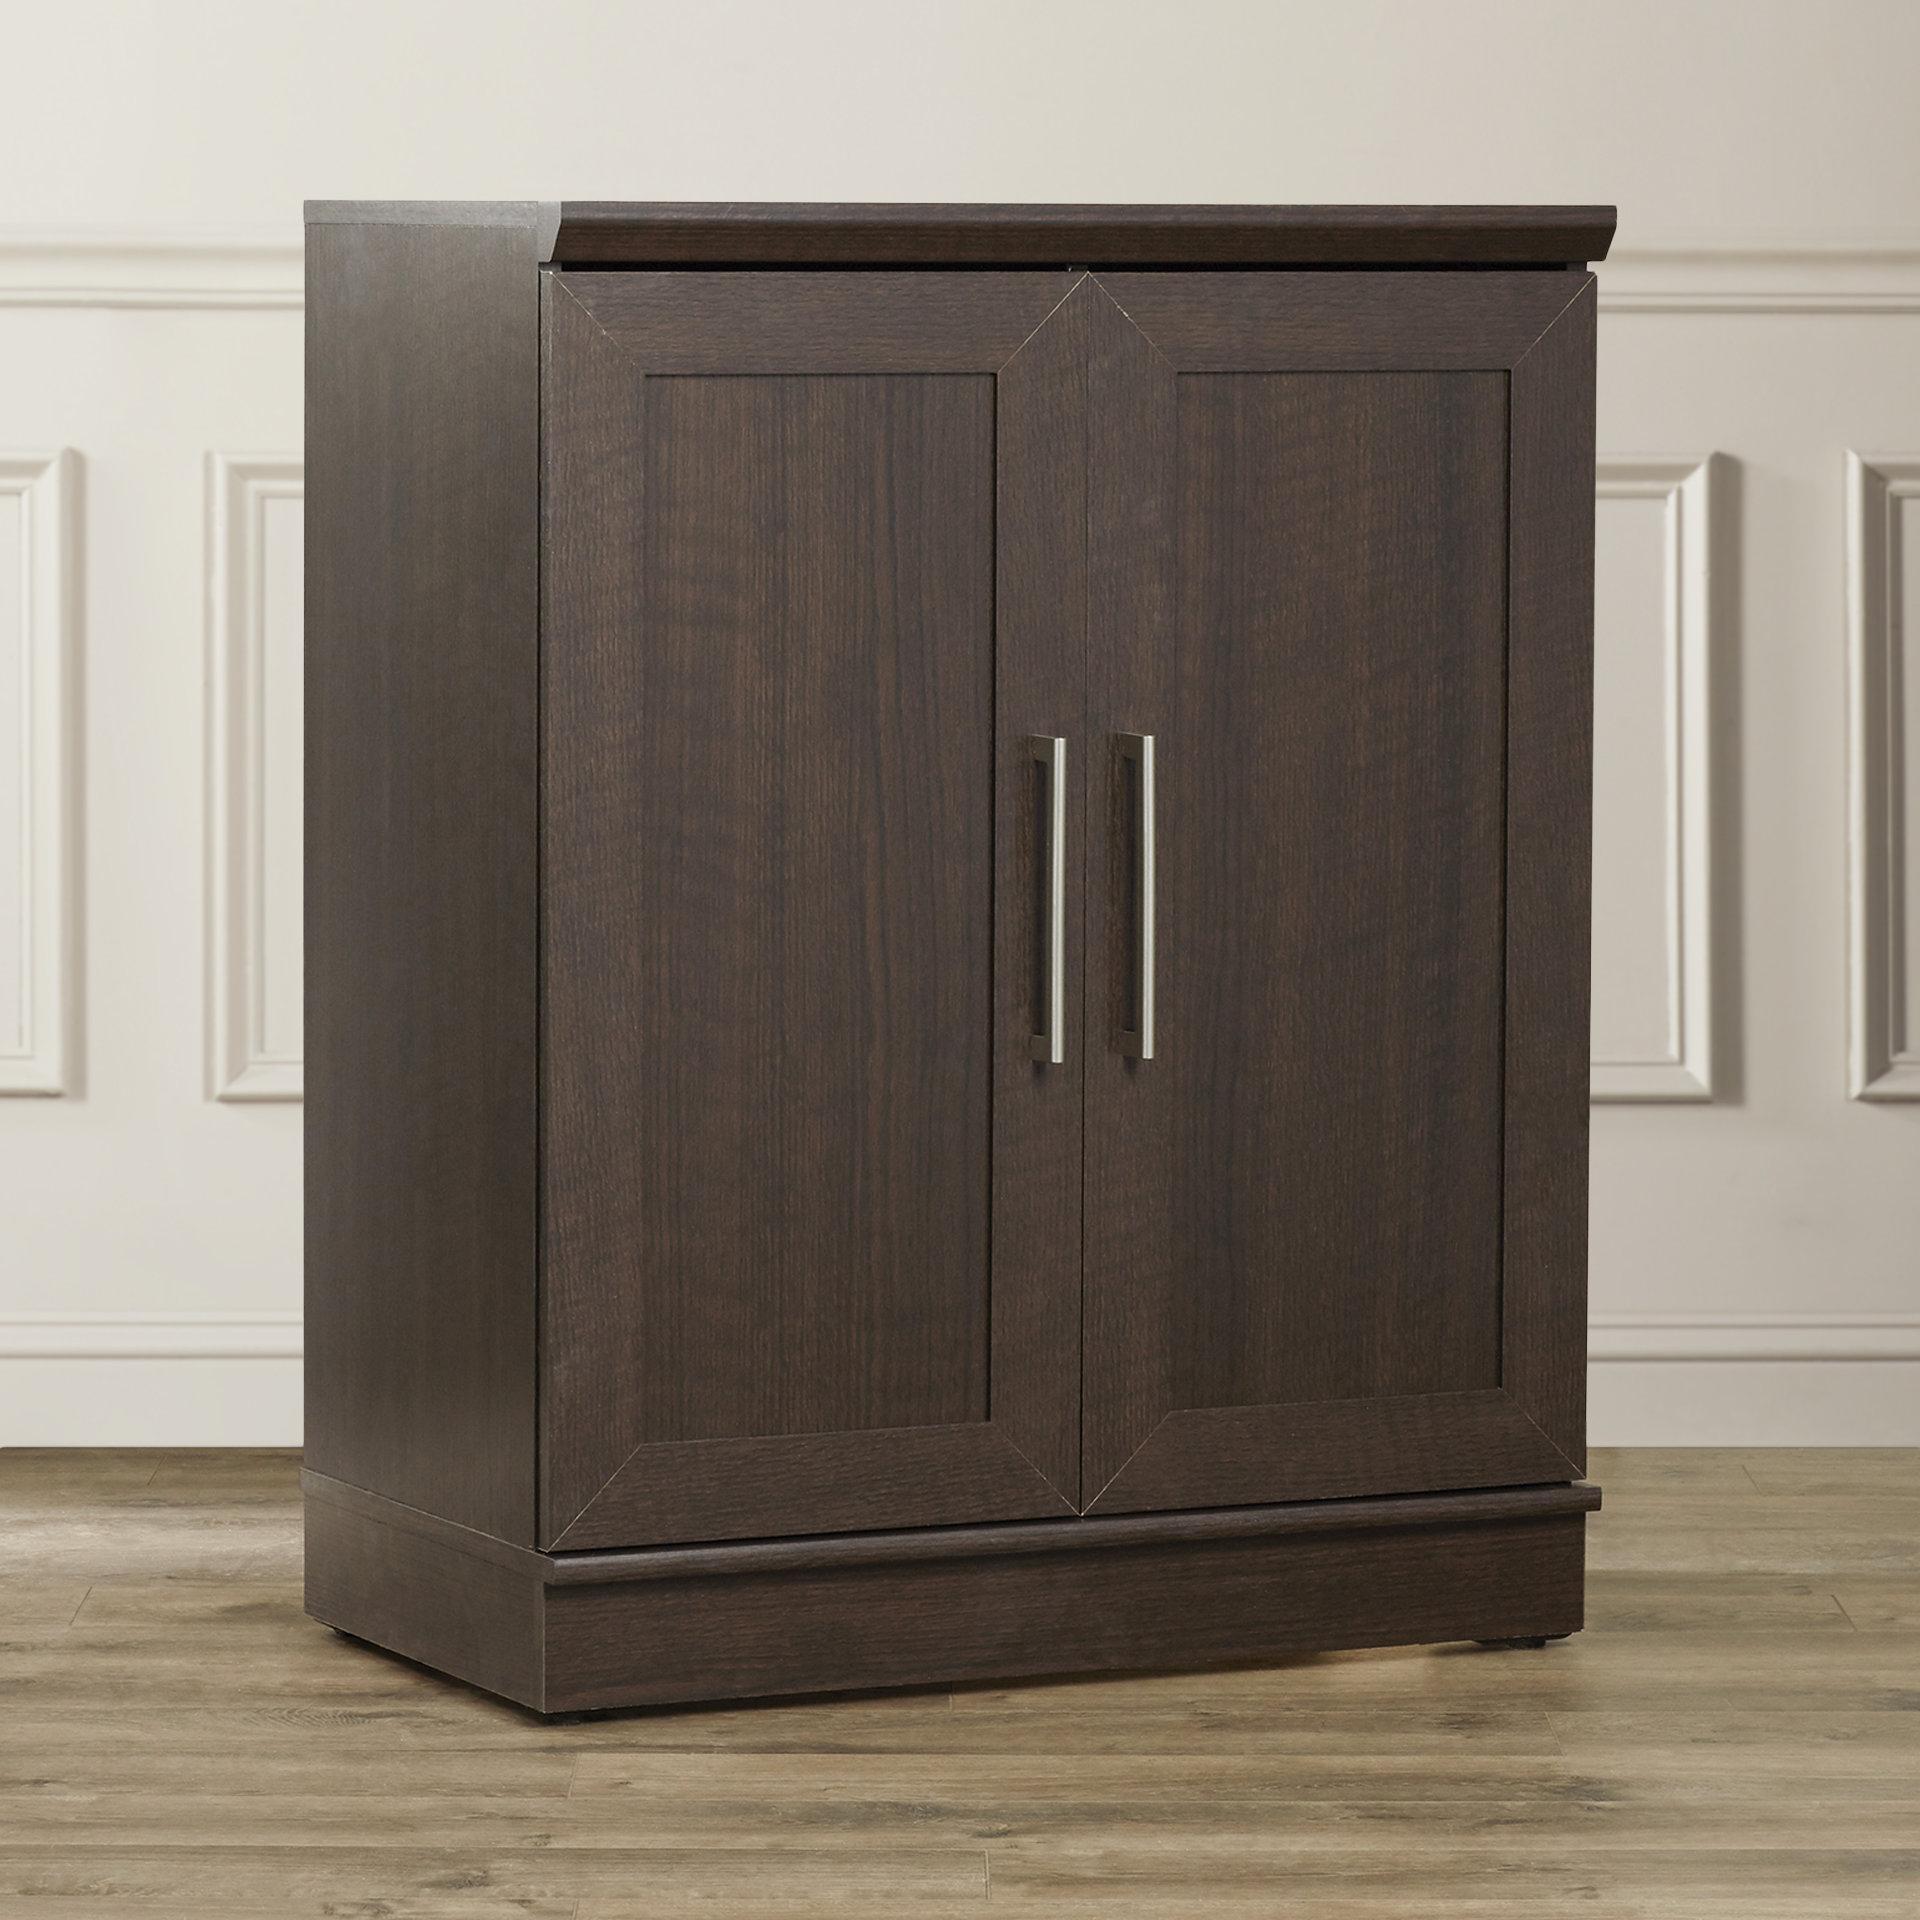 Tiberius 2 Doors Accent Cabinet Regarding Massillon Sideboards (View 19 of 20)